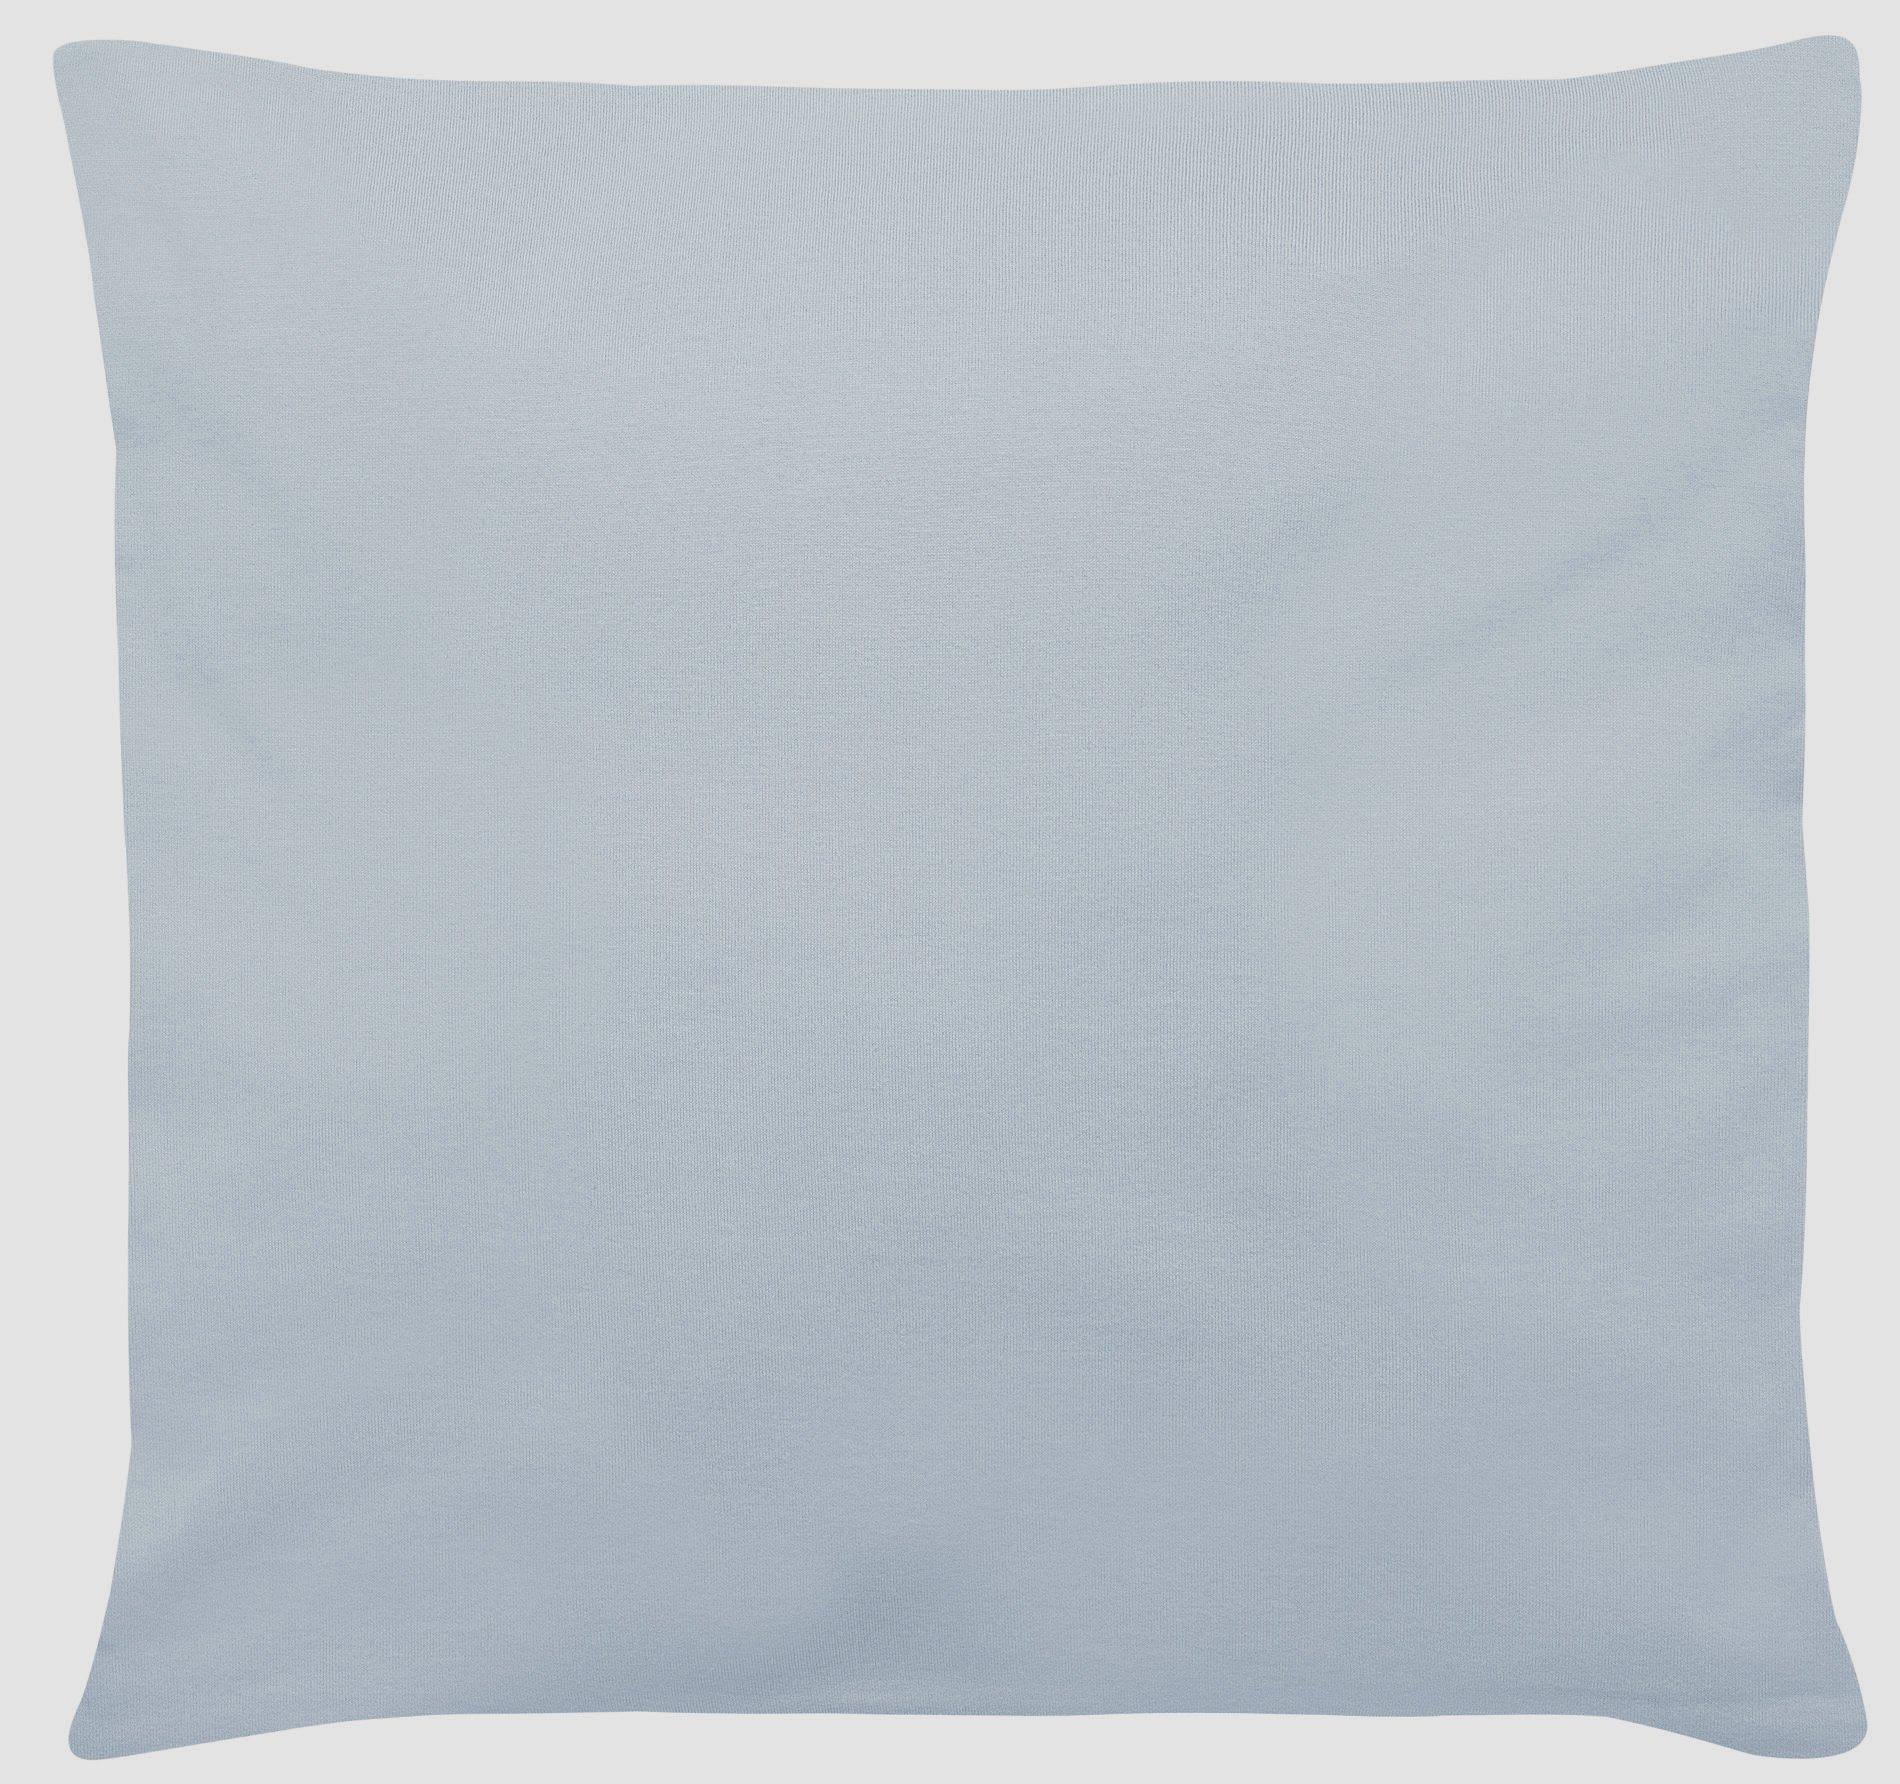 K.-Bezug eisblau 40x40cm